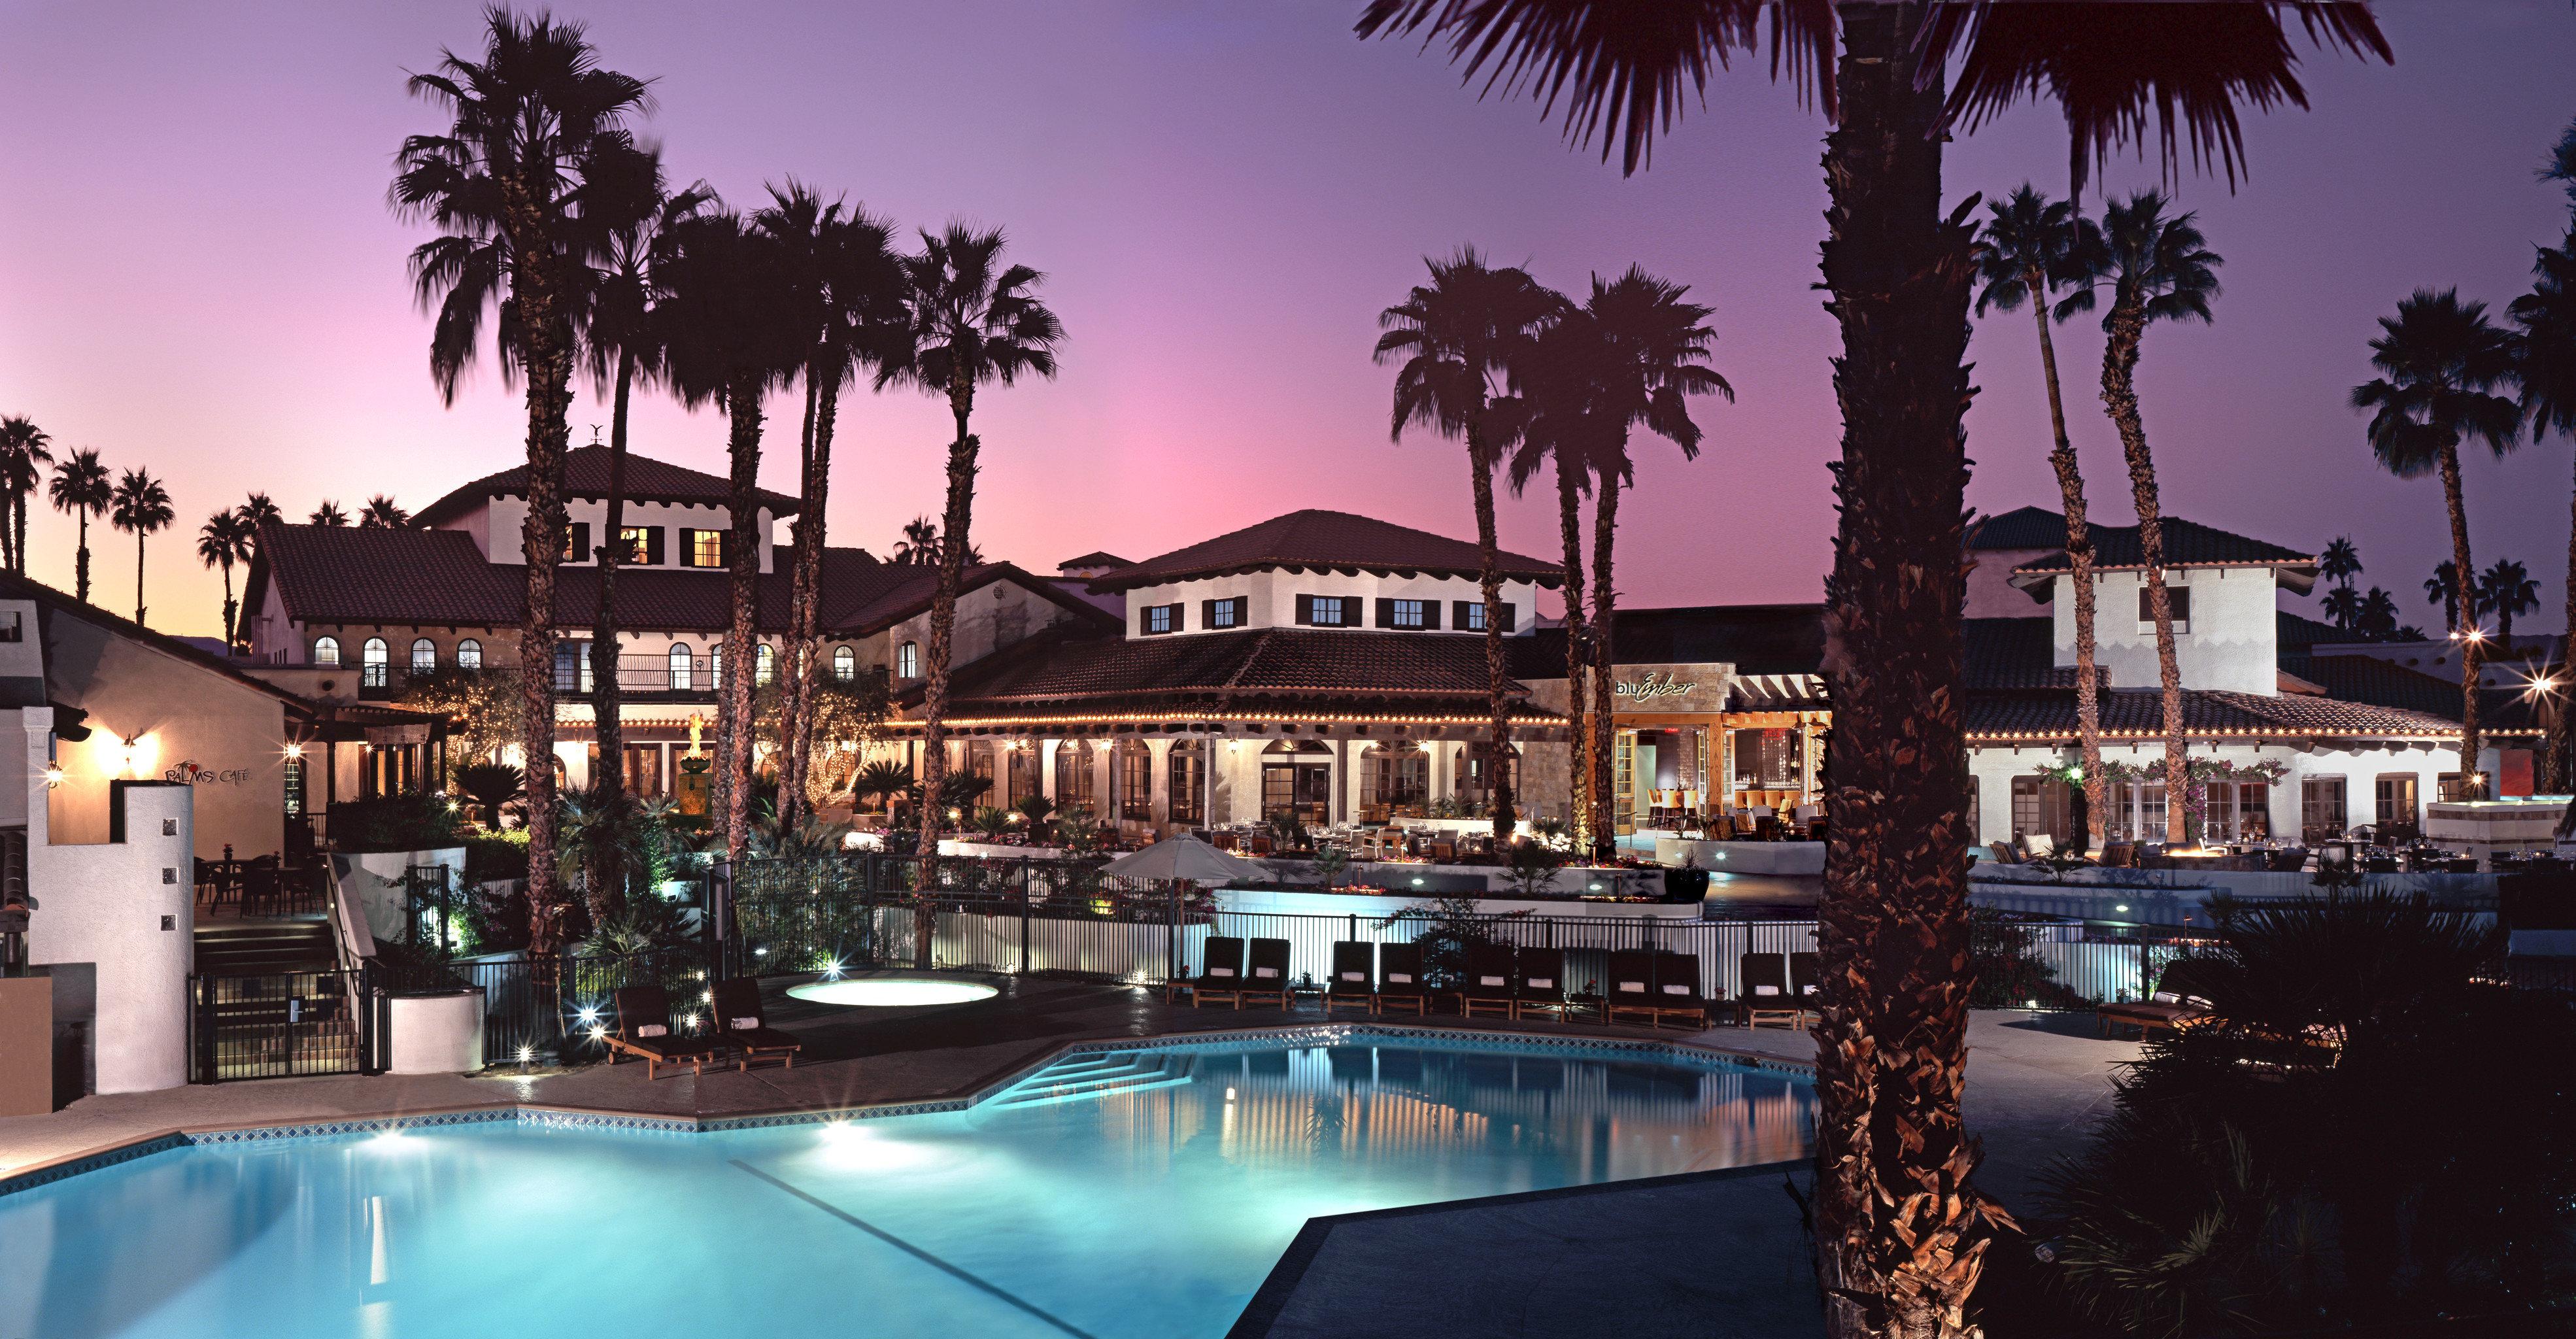 Pool Resort marina tree evening swimming pool plaza dock palm